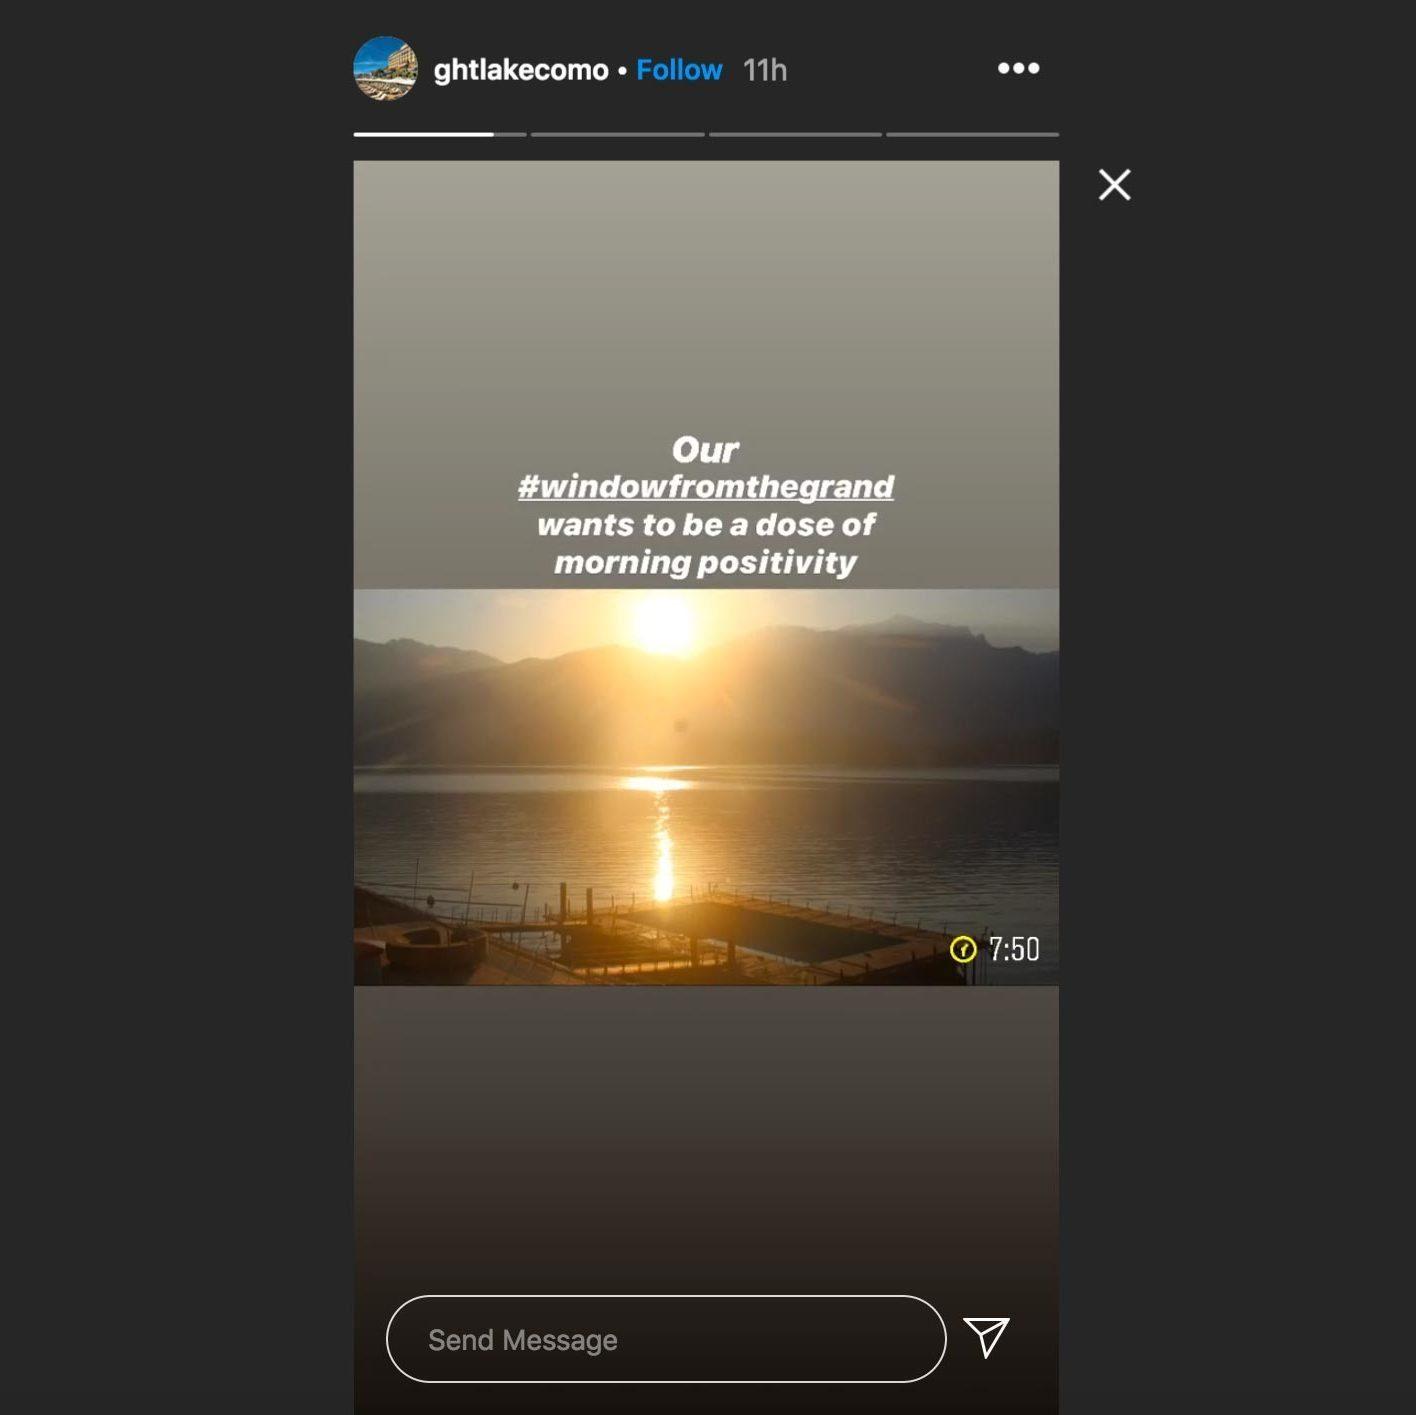 ghtlakecomo instagram story